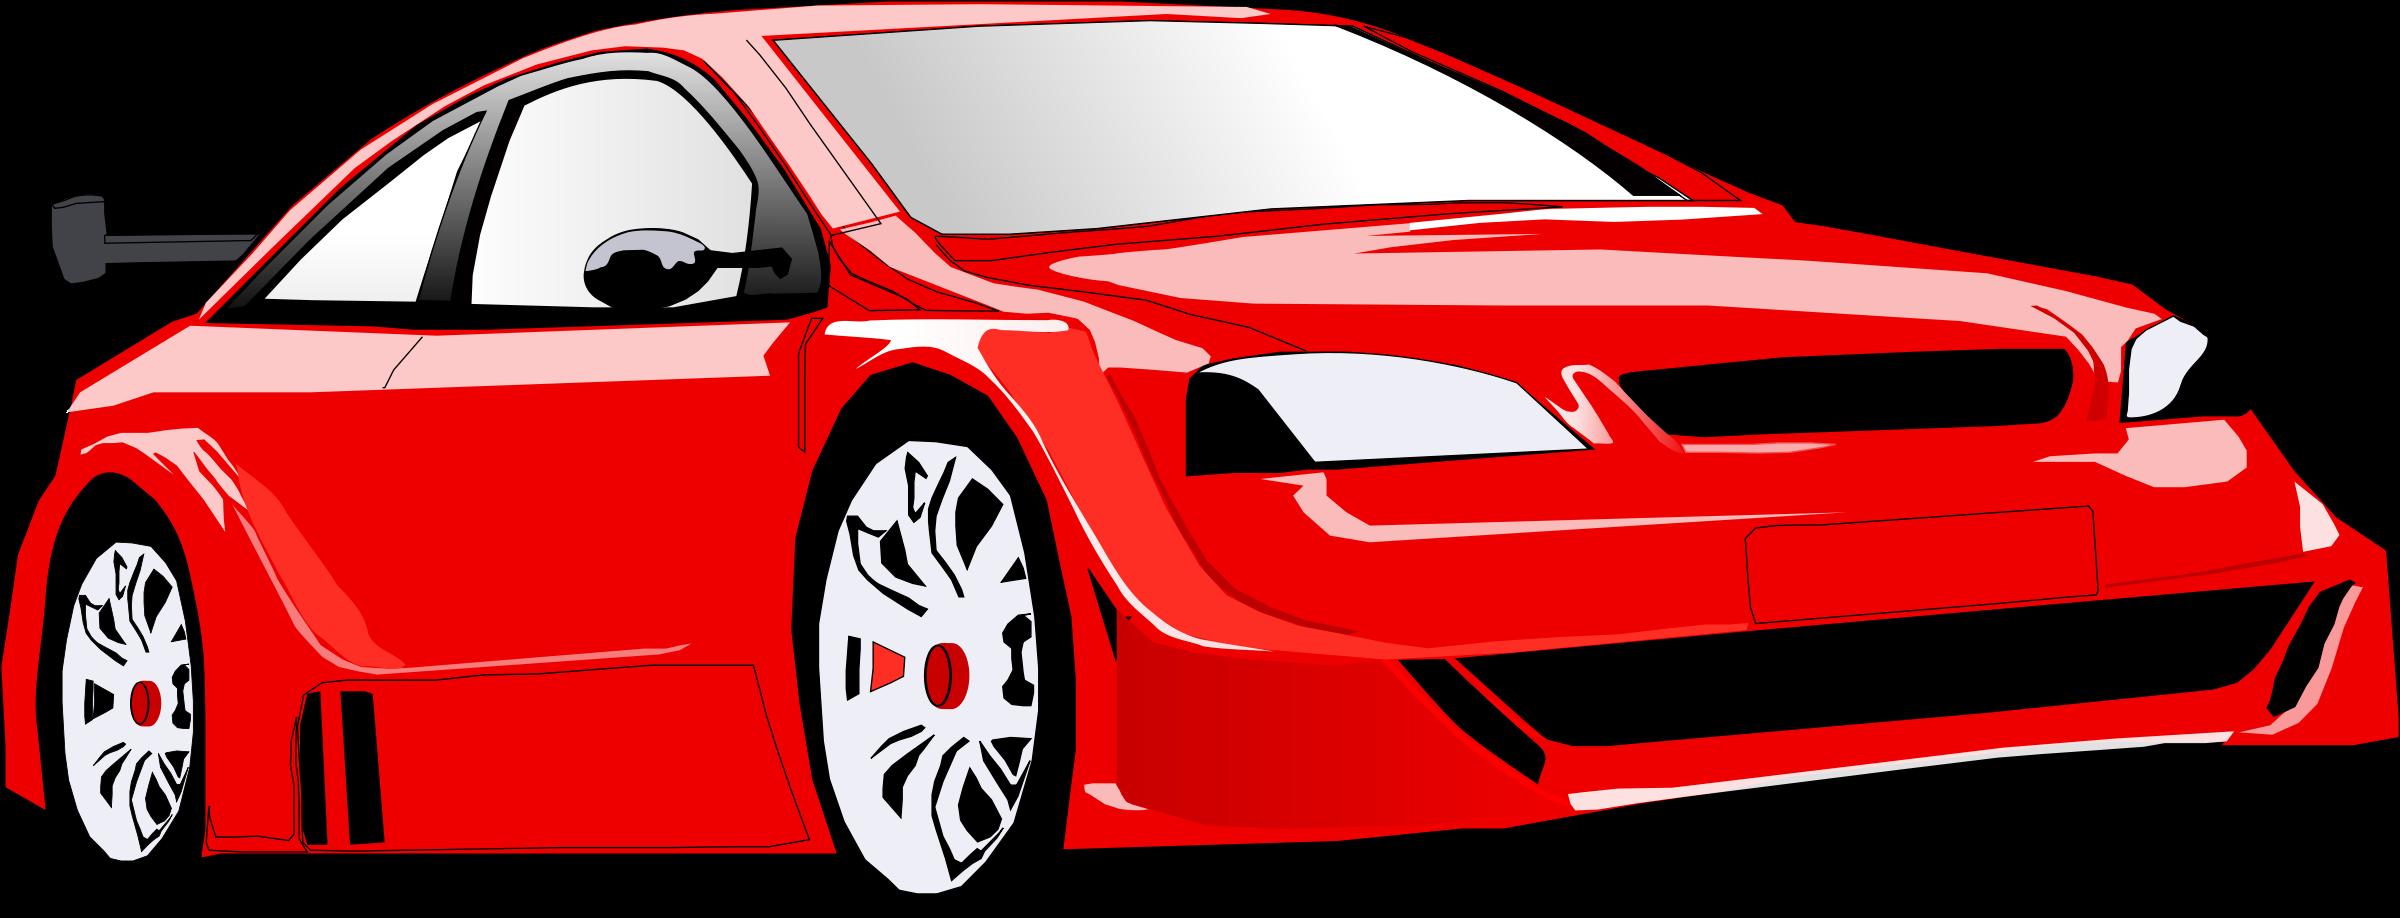 Vehicle clipart transparent car Sports car clipart car a